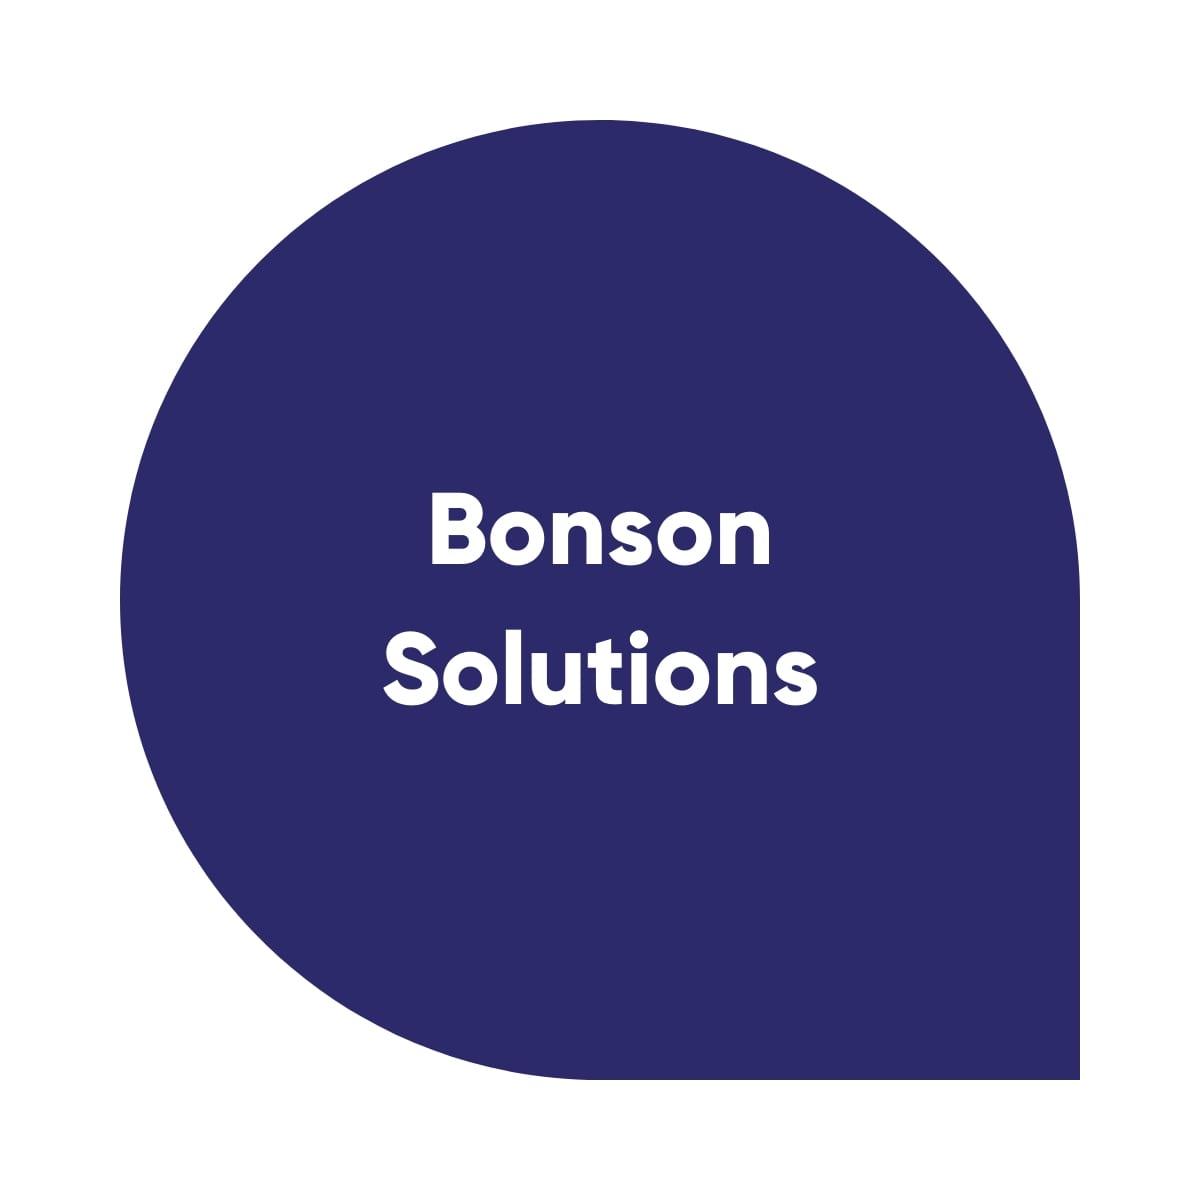 Bonson_solutions-teardot